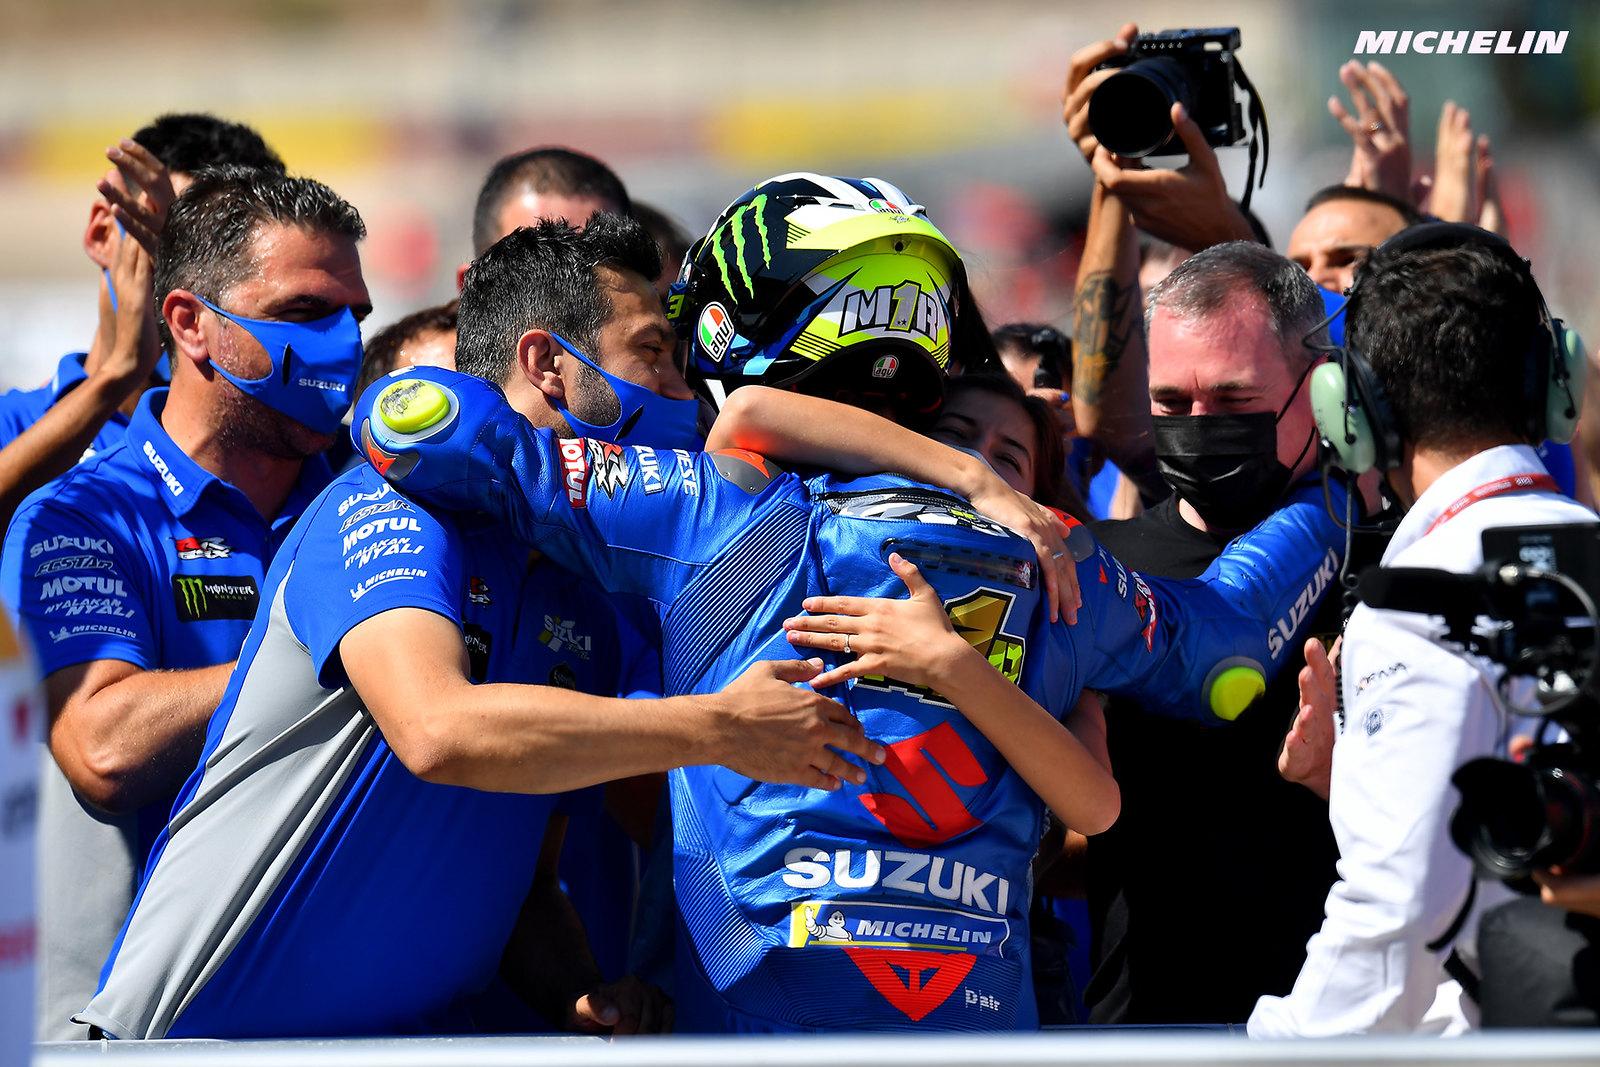 MotoGP2021アラゴンGP 3位ジョアン・ミル「ライバルと比較して加速性の改善が必要」